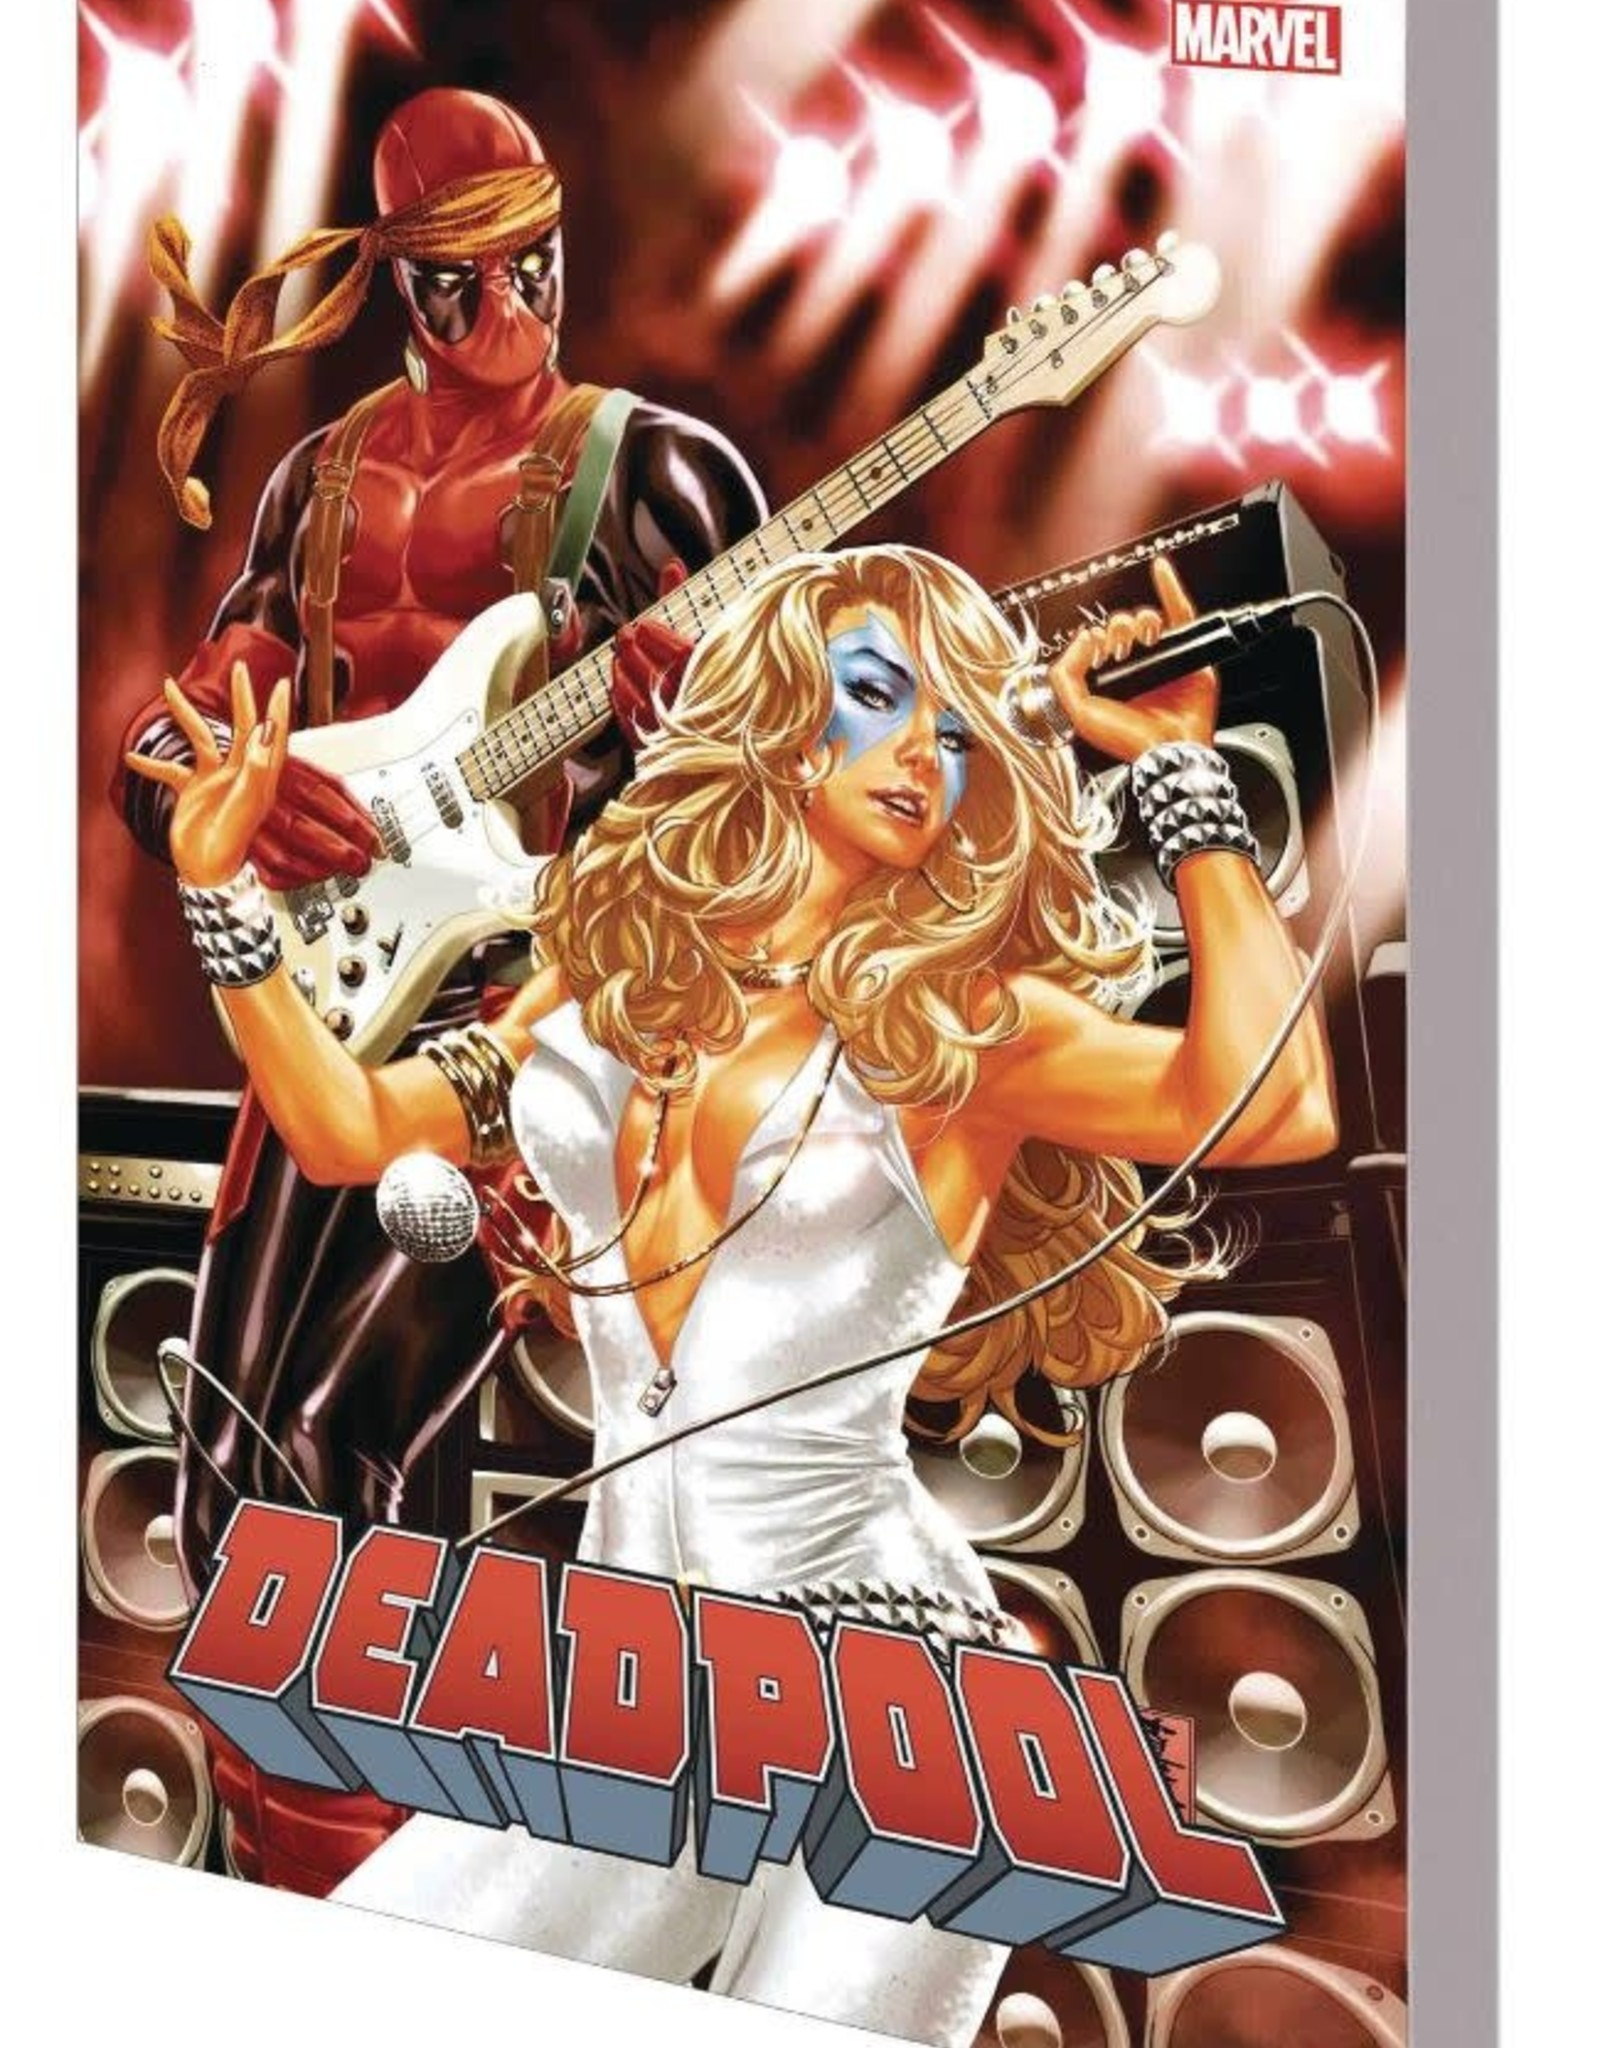 Marvel Comics Deadpool by Posehn & Duggan Complete Collection Vol 03 TP